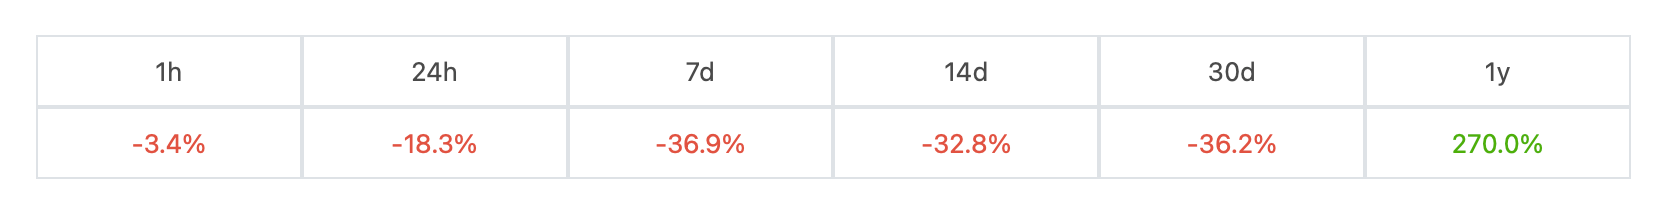 биткоин курс цена